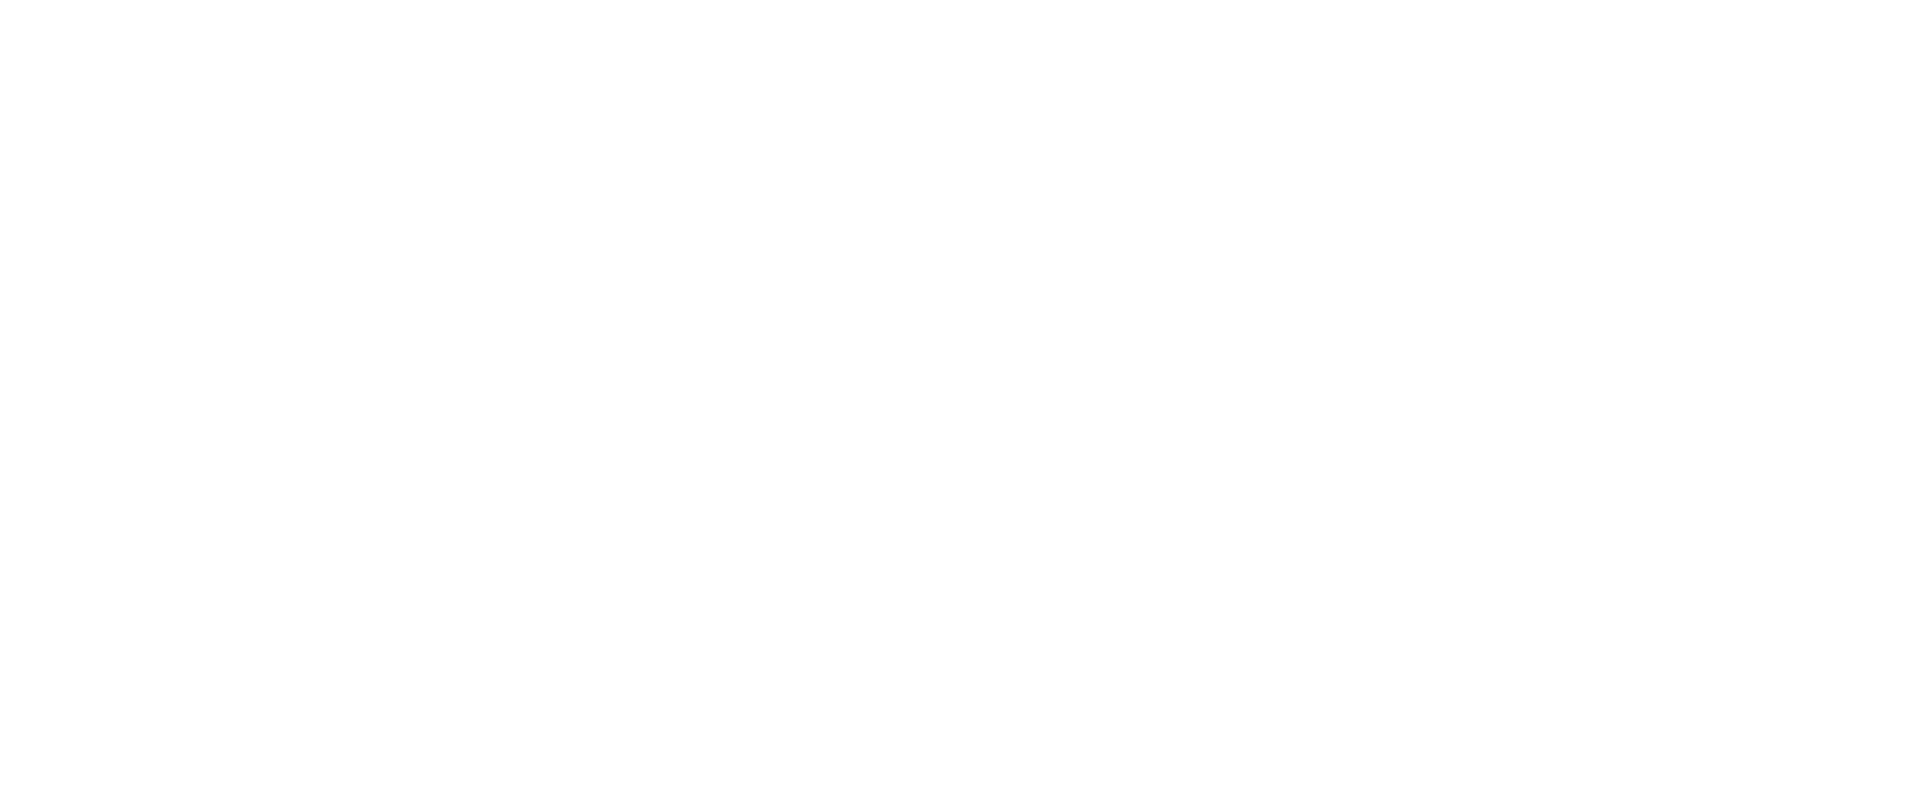 trasparenza-1920x800